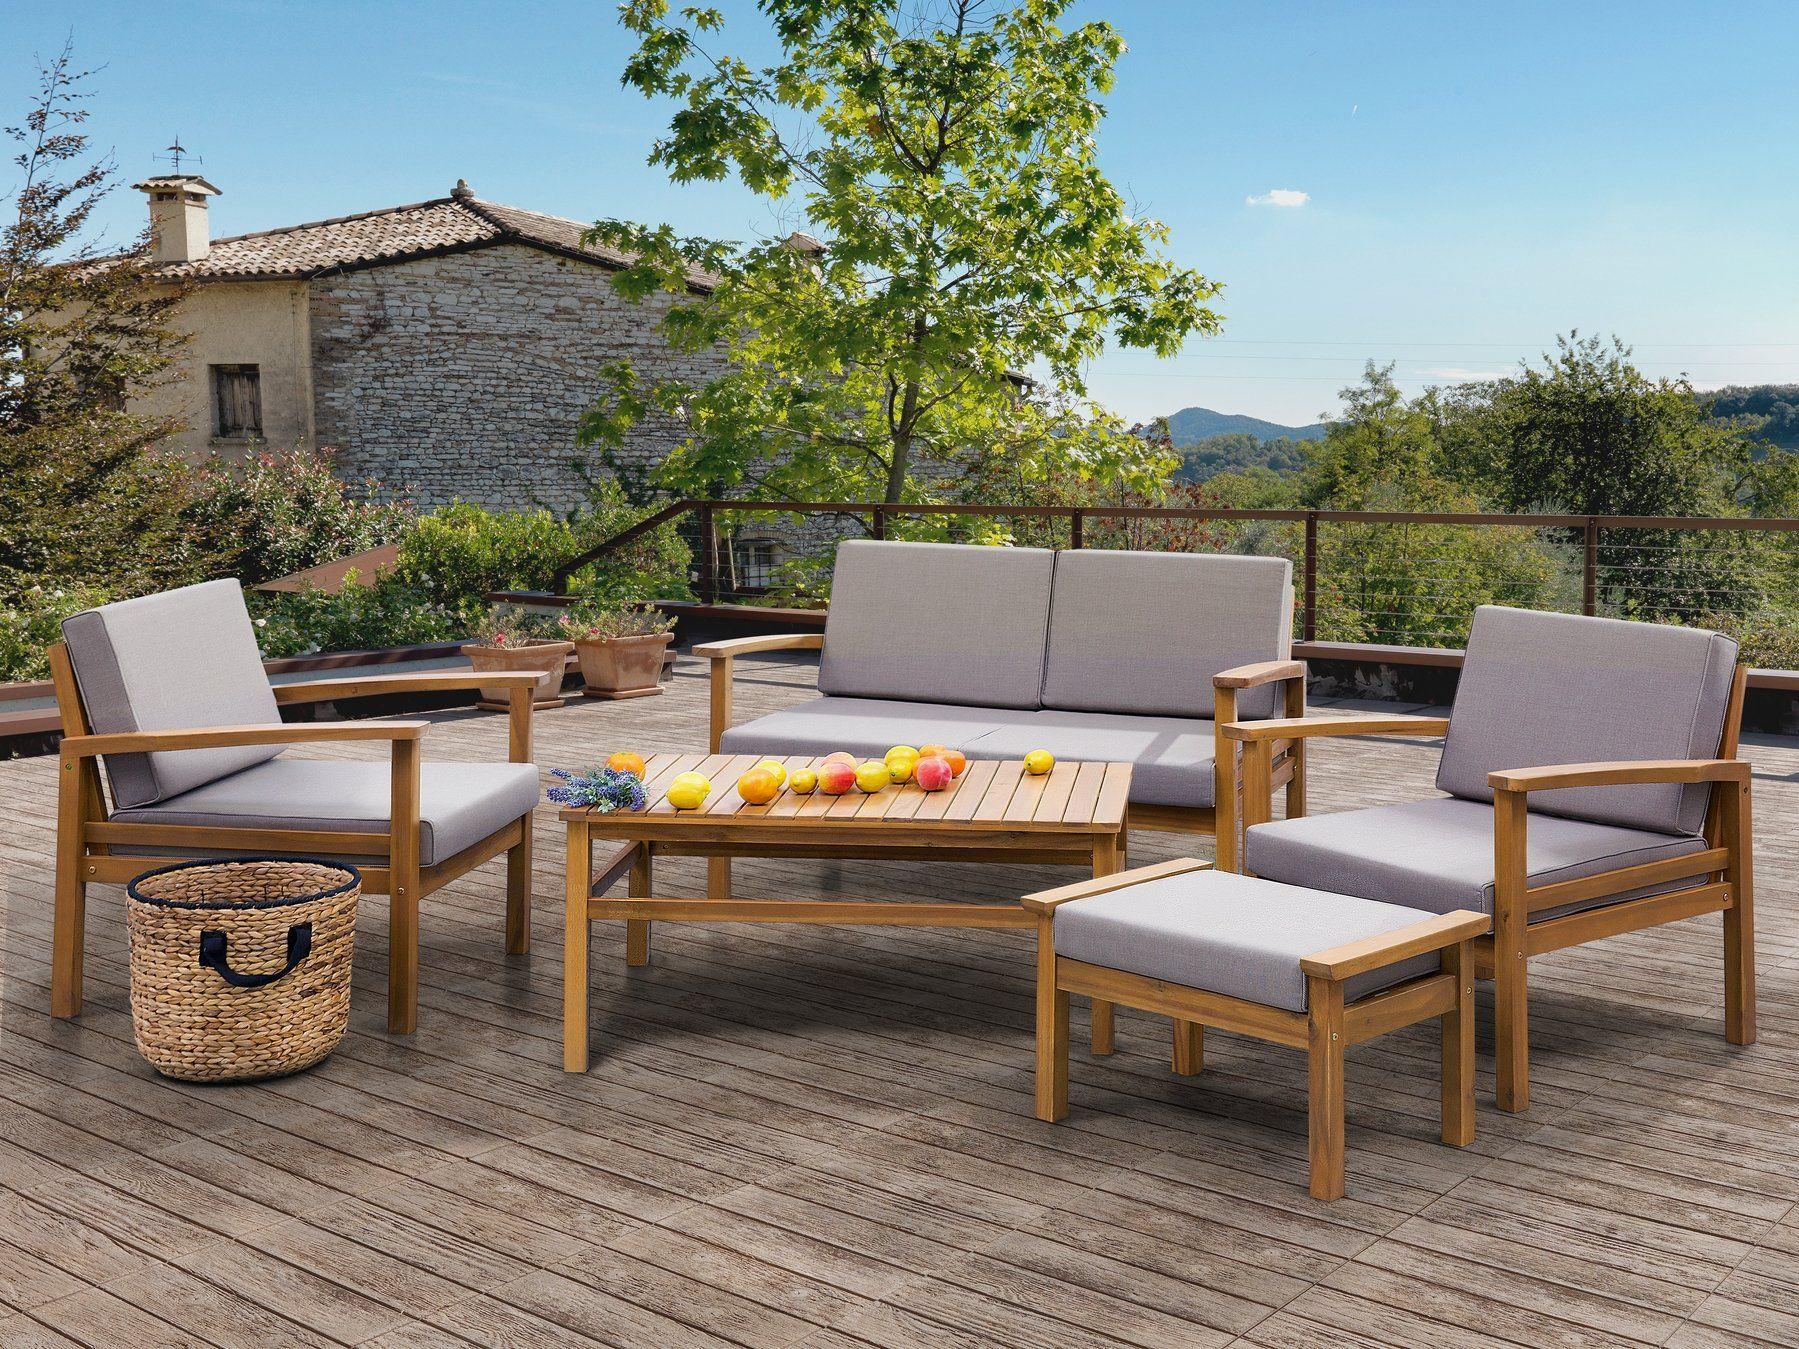 Acacia Wood Garden Conversation Set Manila Outdoor Sofa Sets Garden In The Woods Outdoor Furniture Sets